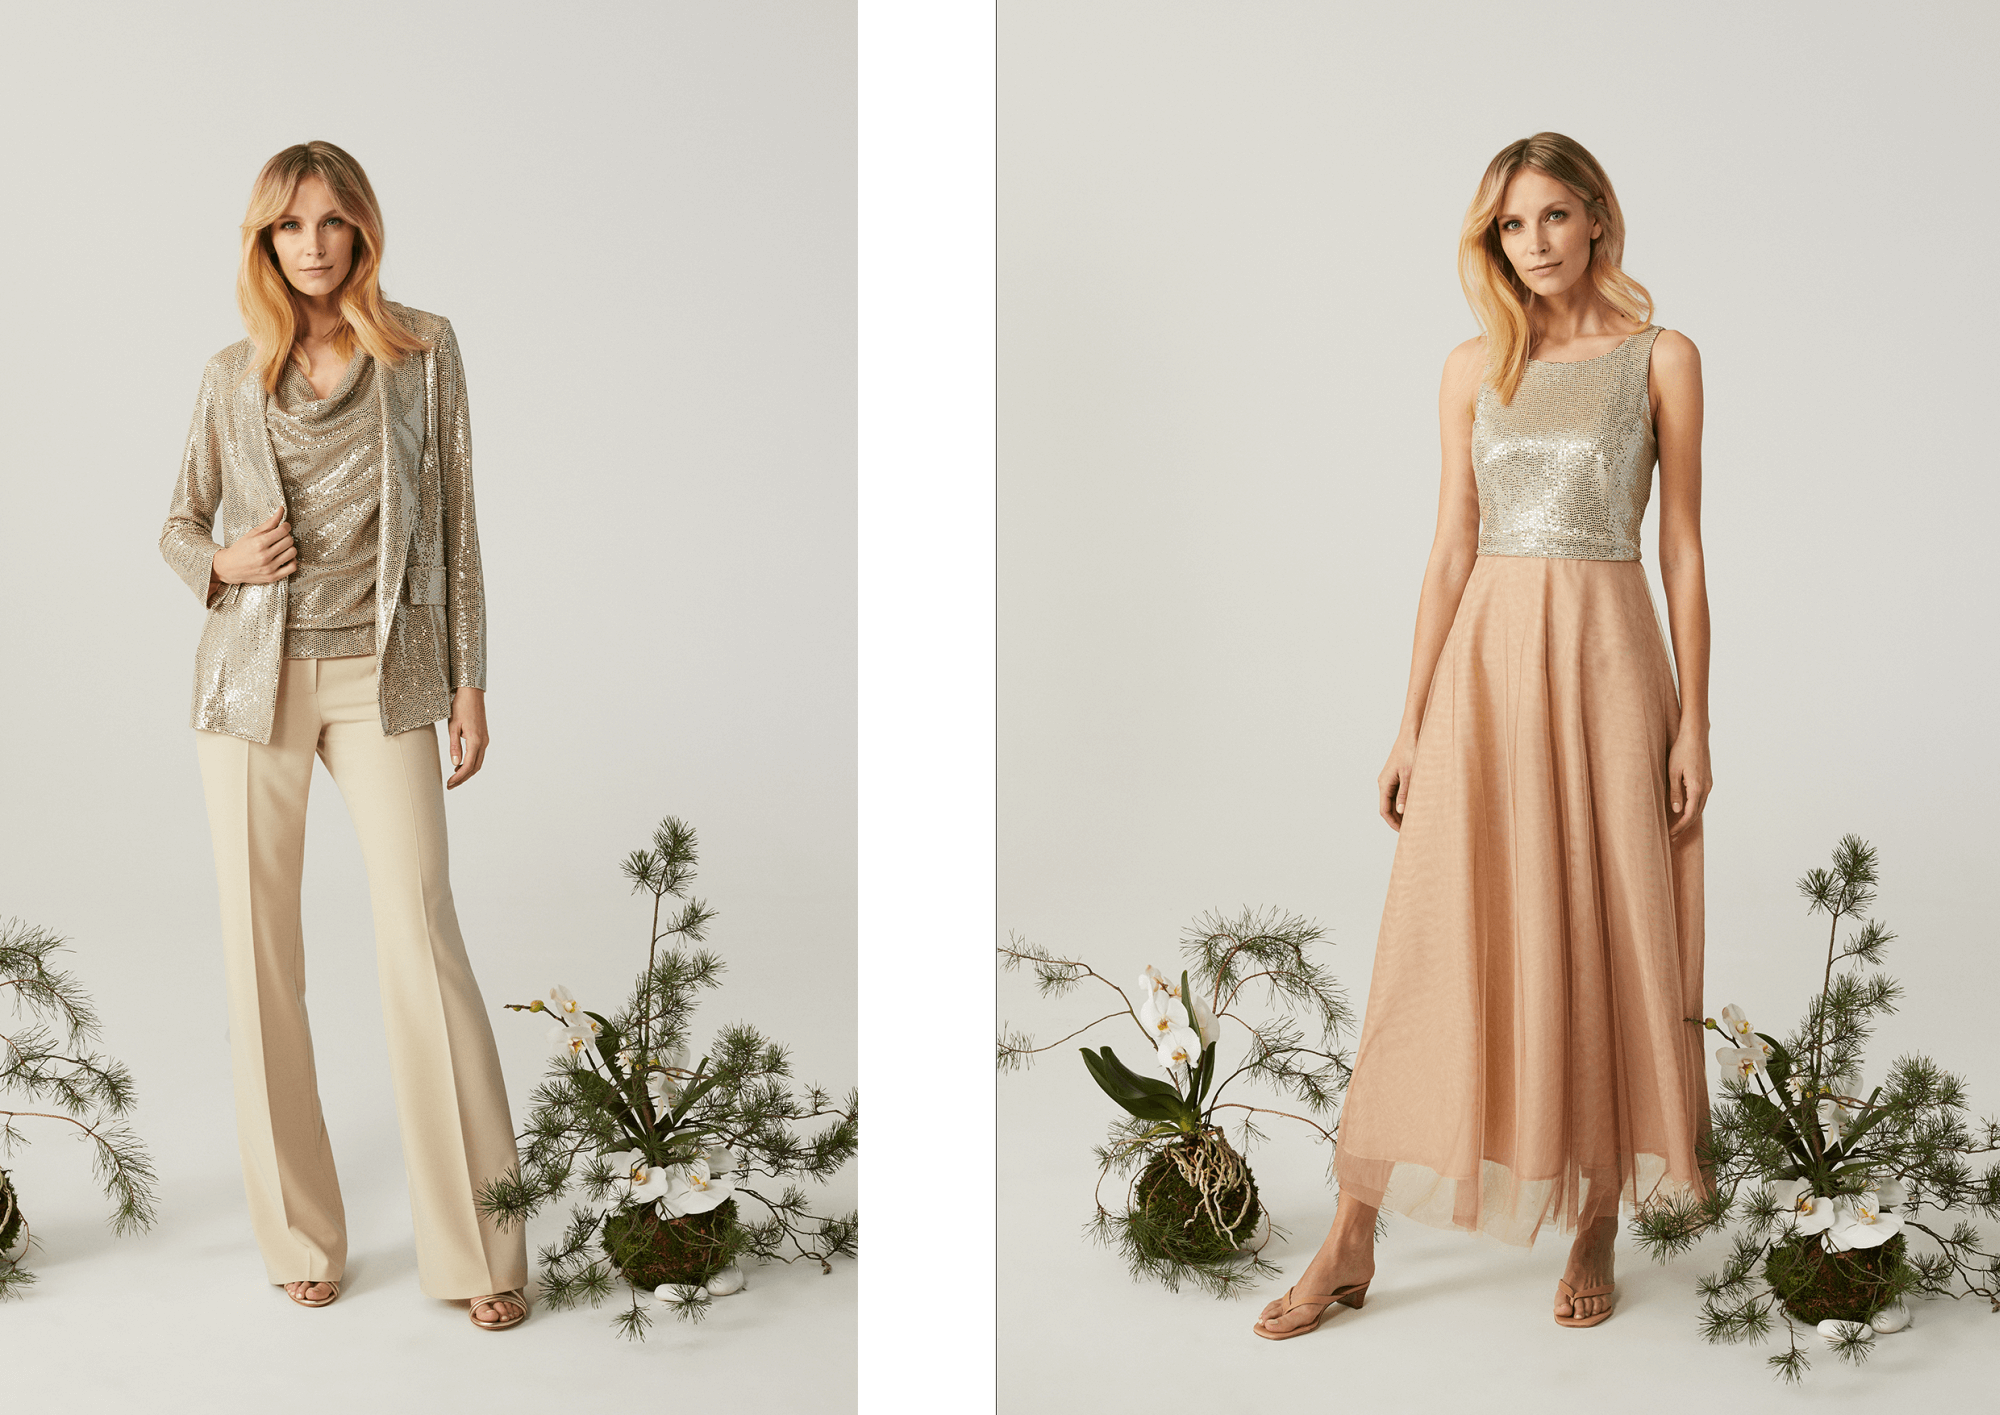 https://denicler.eu/ różowe sety sukienki na wiosnę i lato 2021